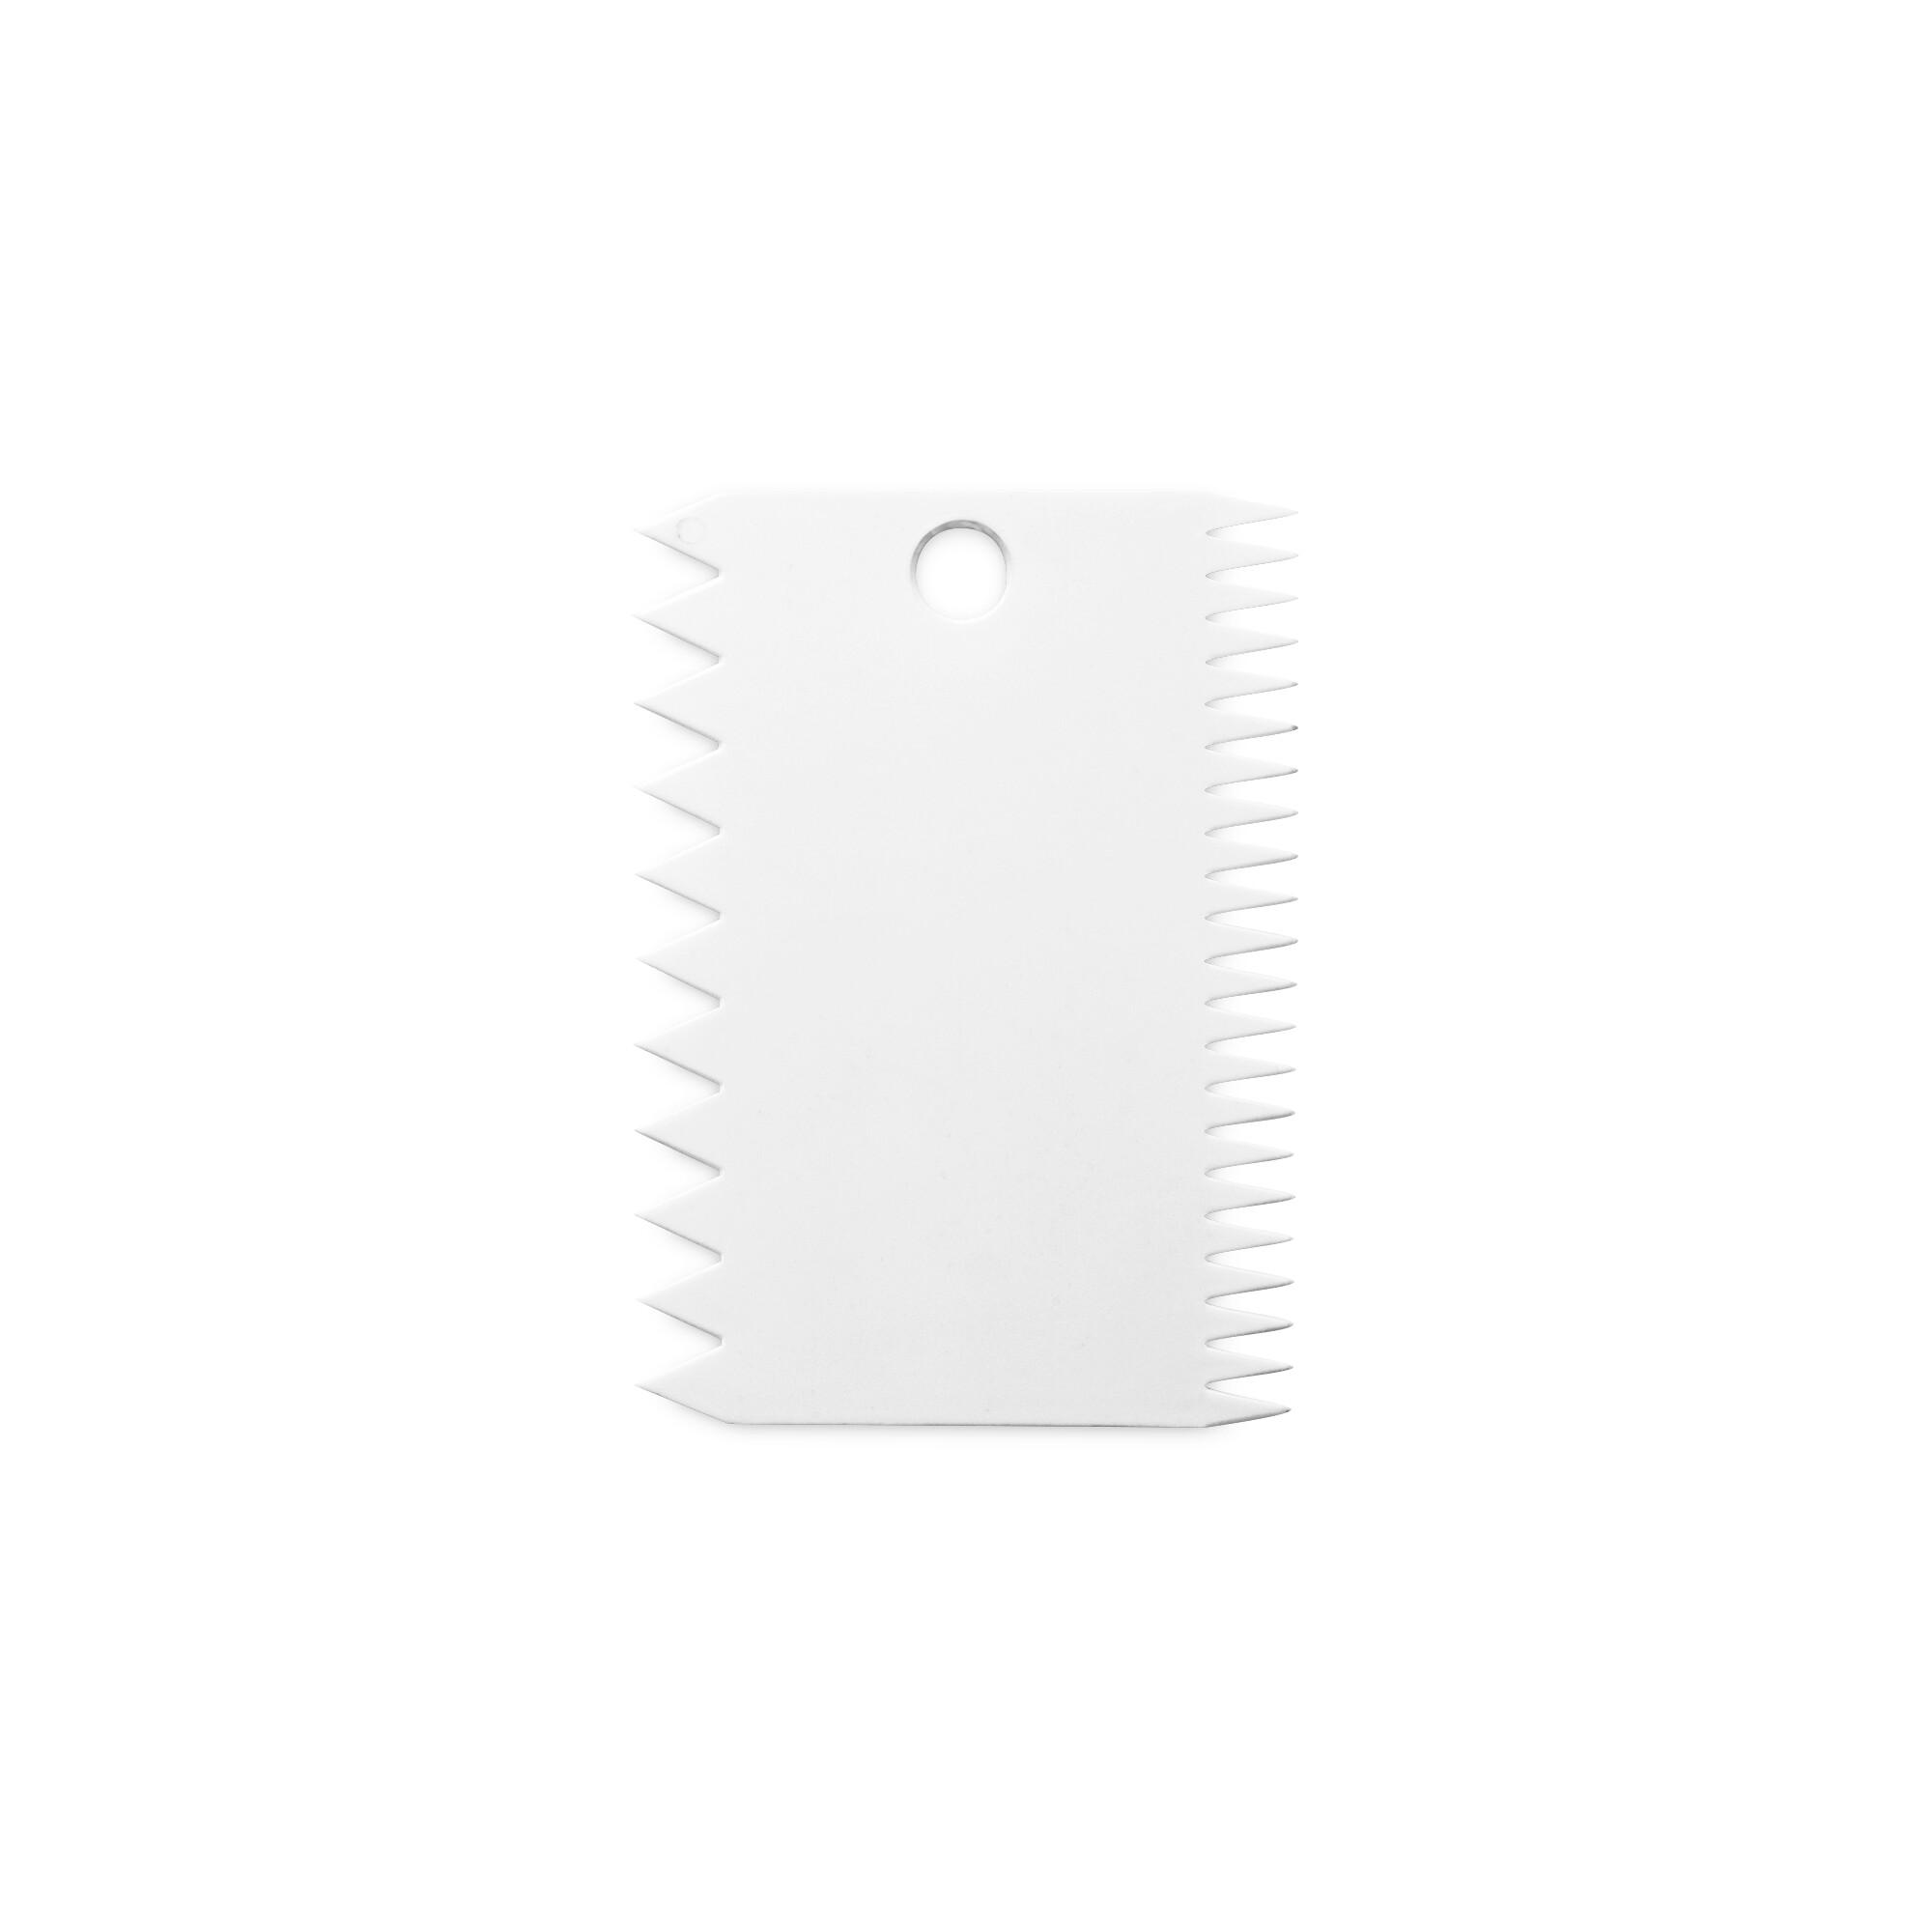 Icing comb